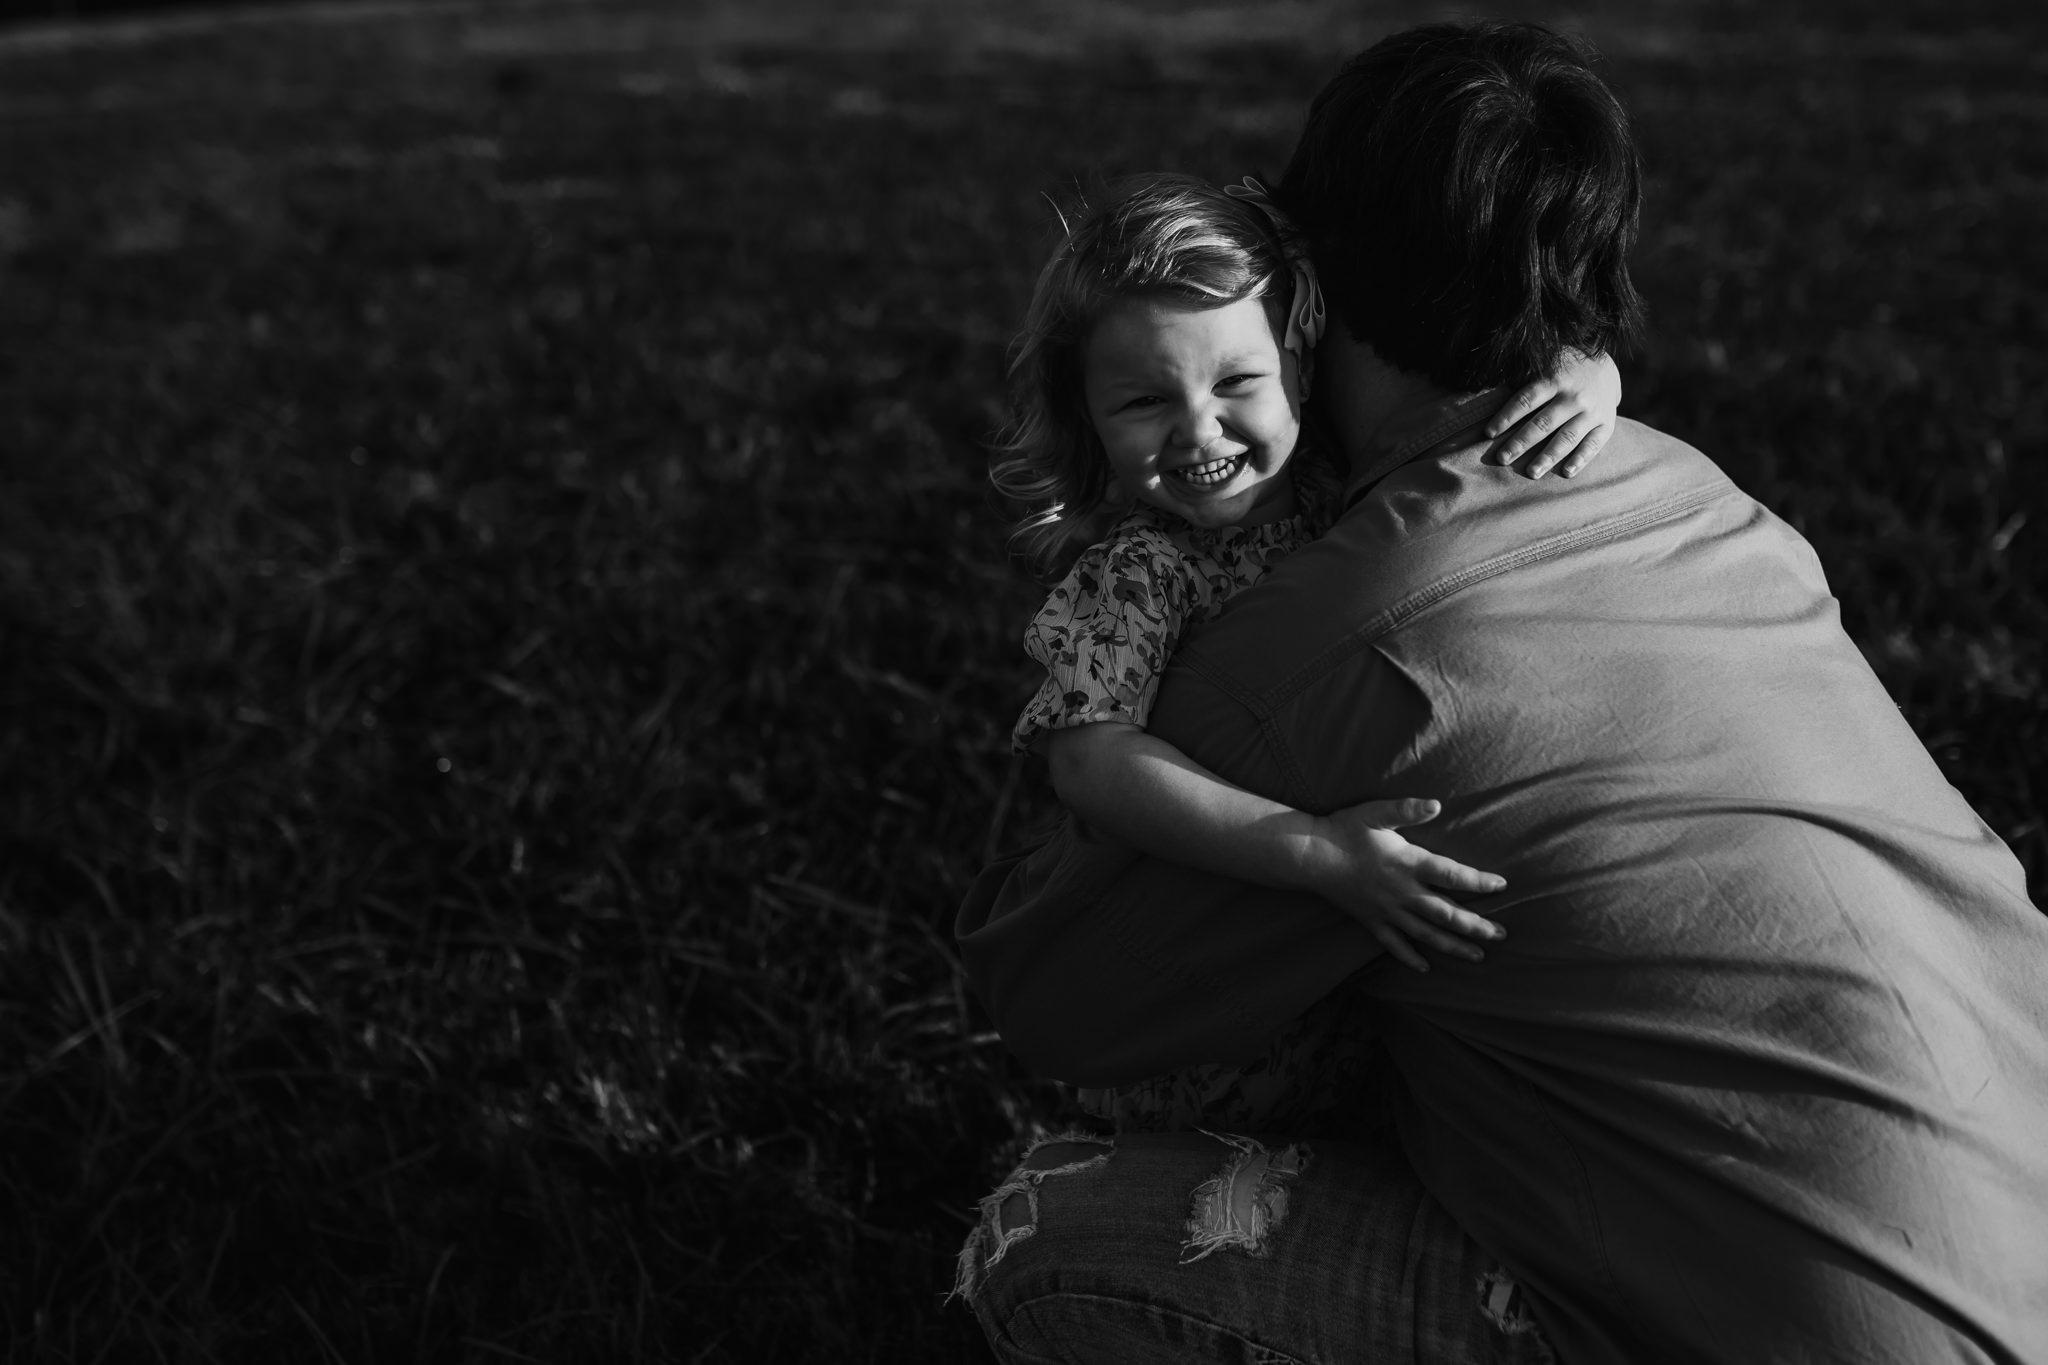 cassie-cook-photography-memphis-family-photographer-lifestyle-family-photographer-sunrise-gray-family-65.jpg